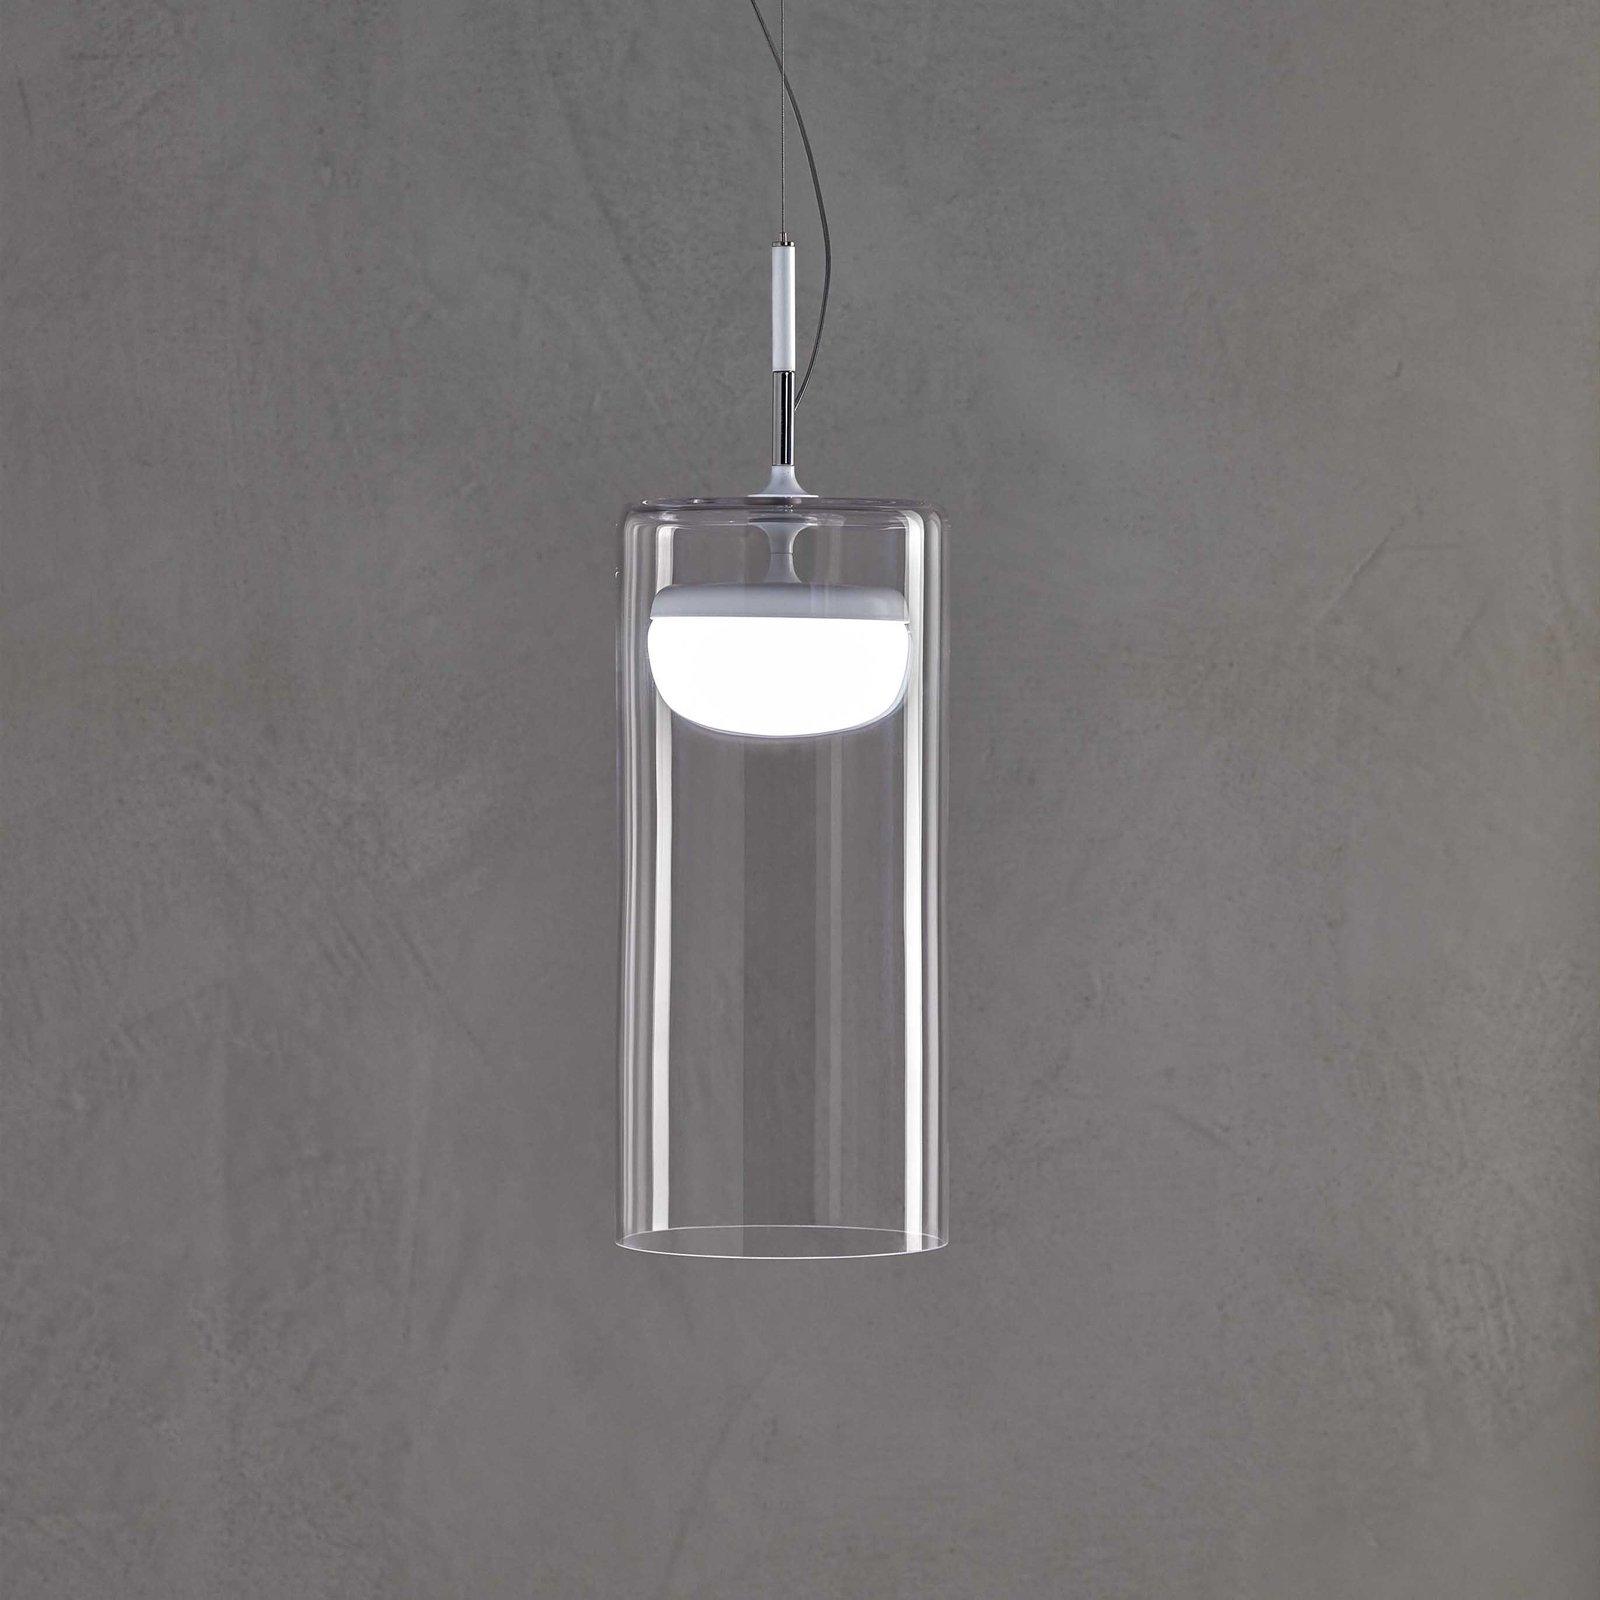 Prandina Driver LED-hengelampe S5 2 700 K hvit